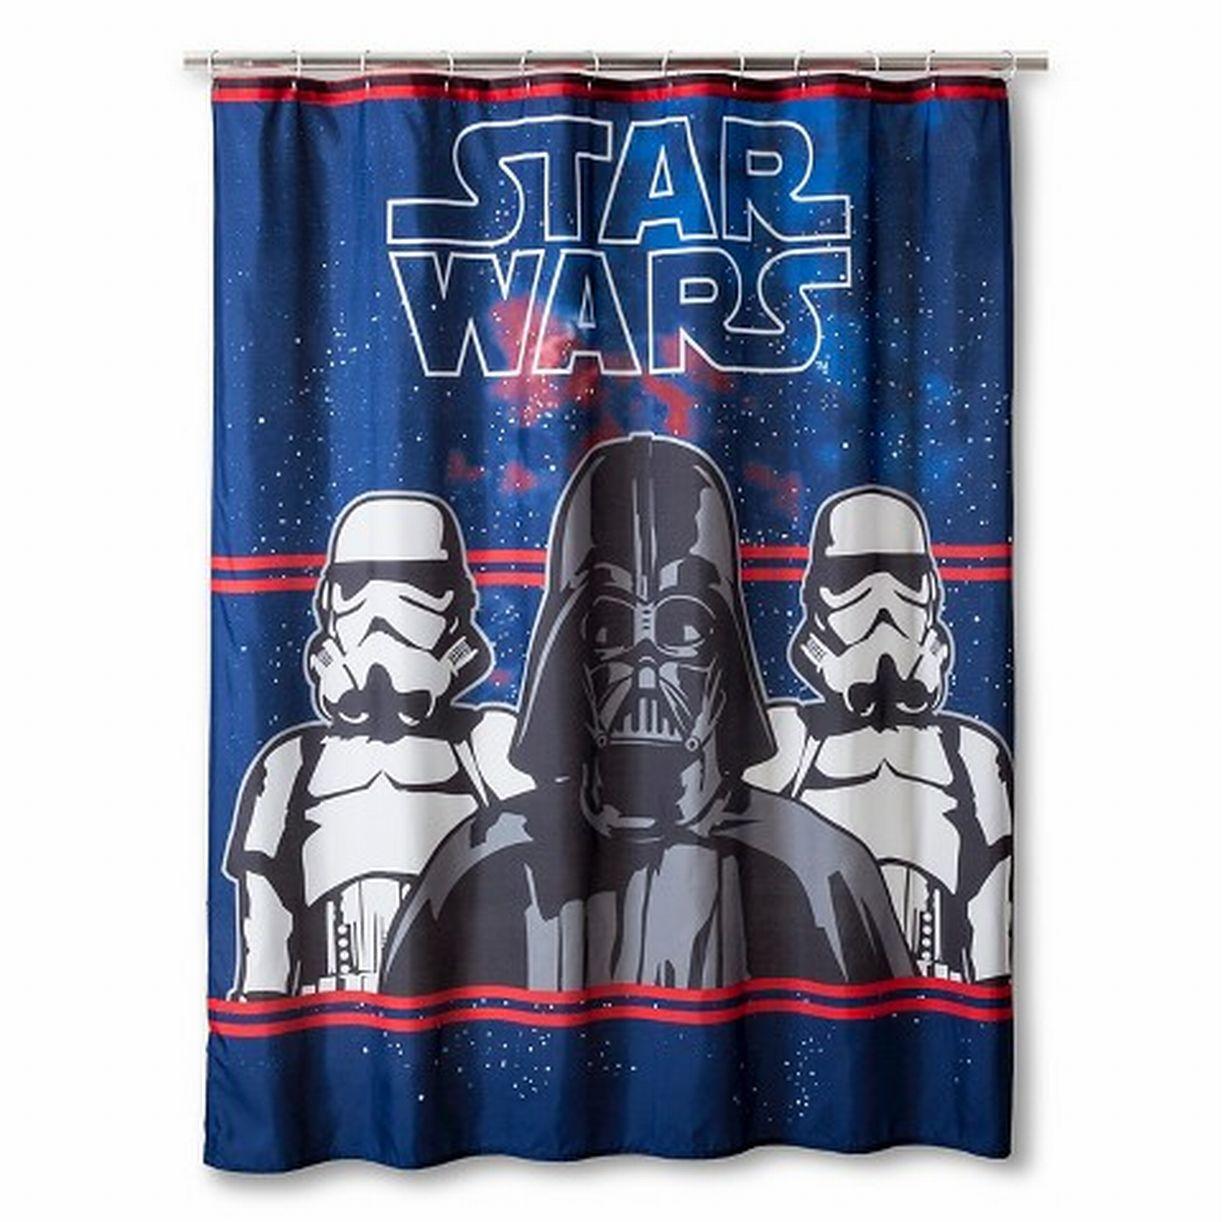 Disney Star Wars Darth Vader Fabric Shower Curtain Kids